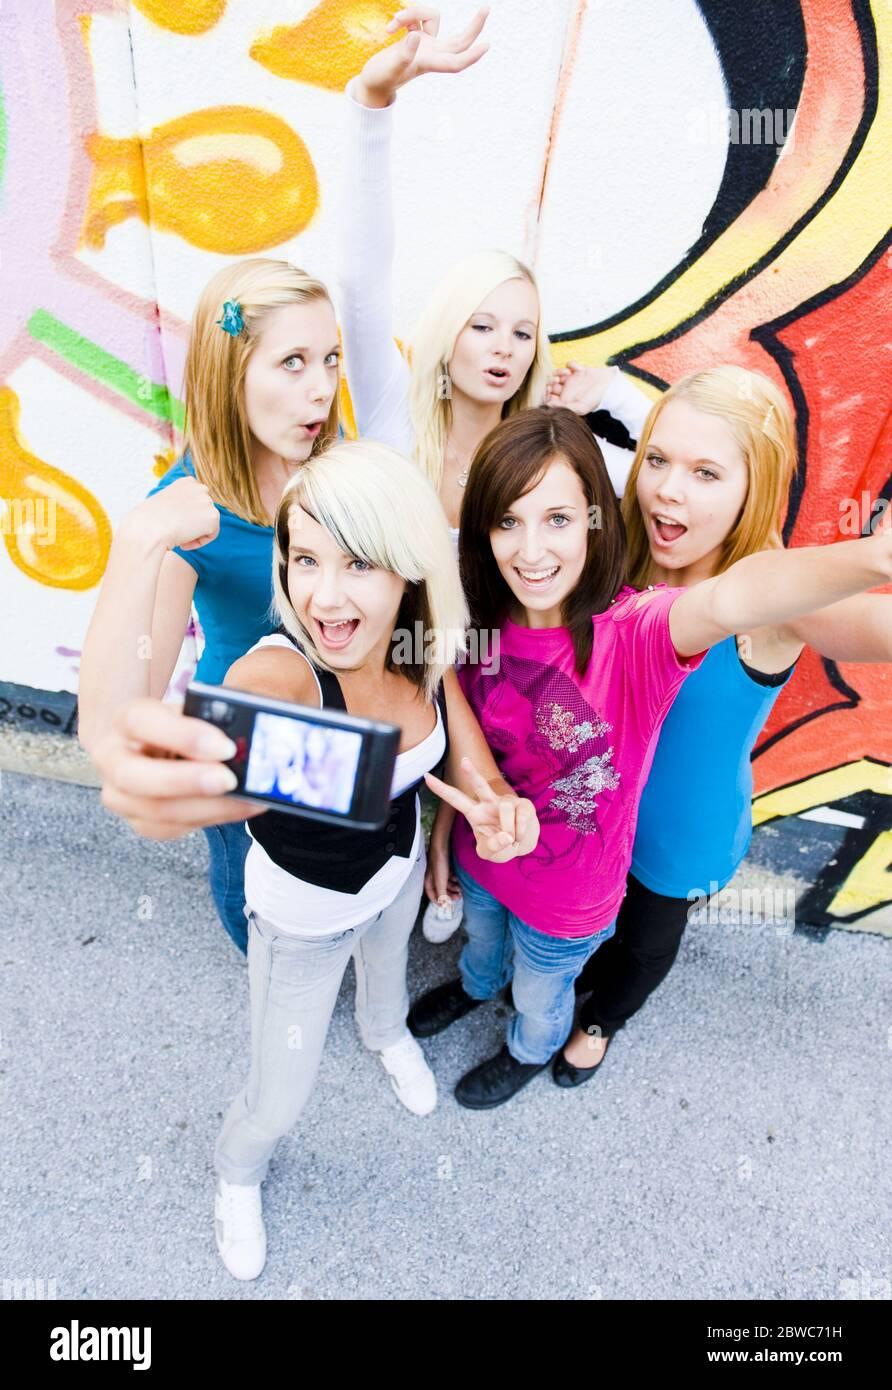 Selfie in der Schule, MR: Sì Foto Stock